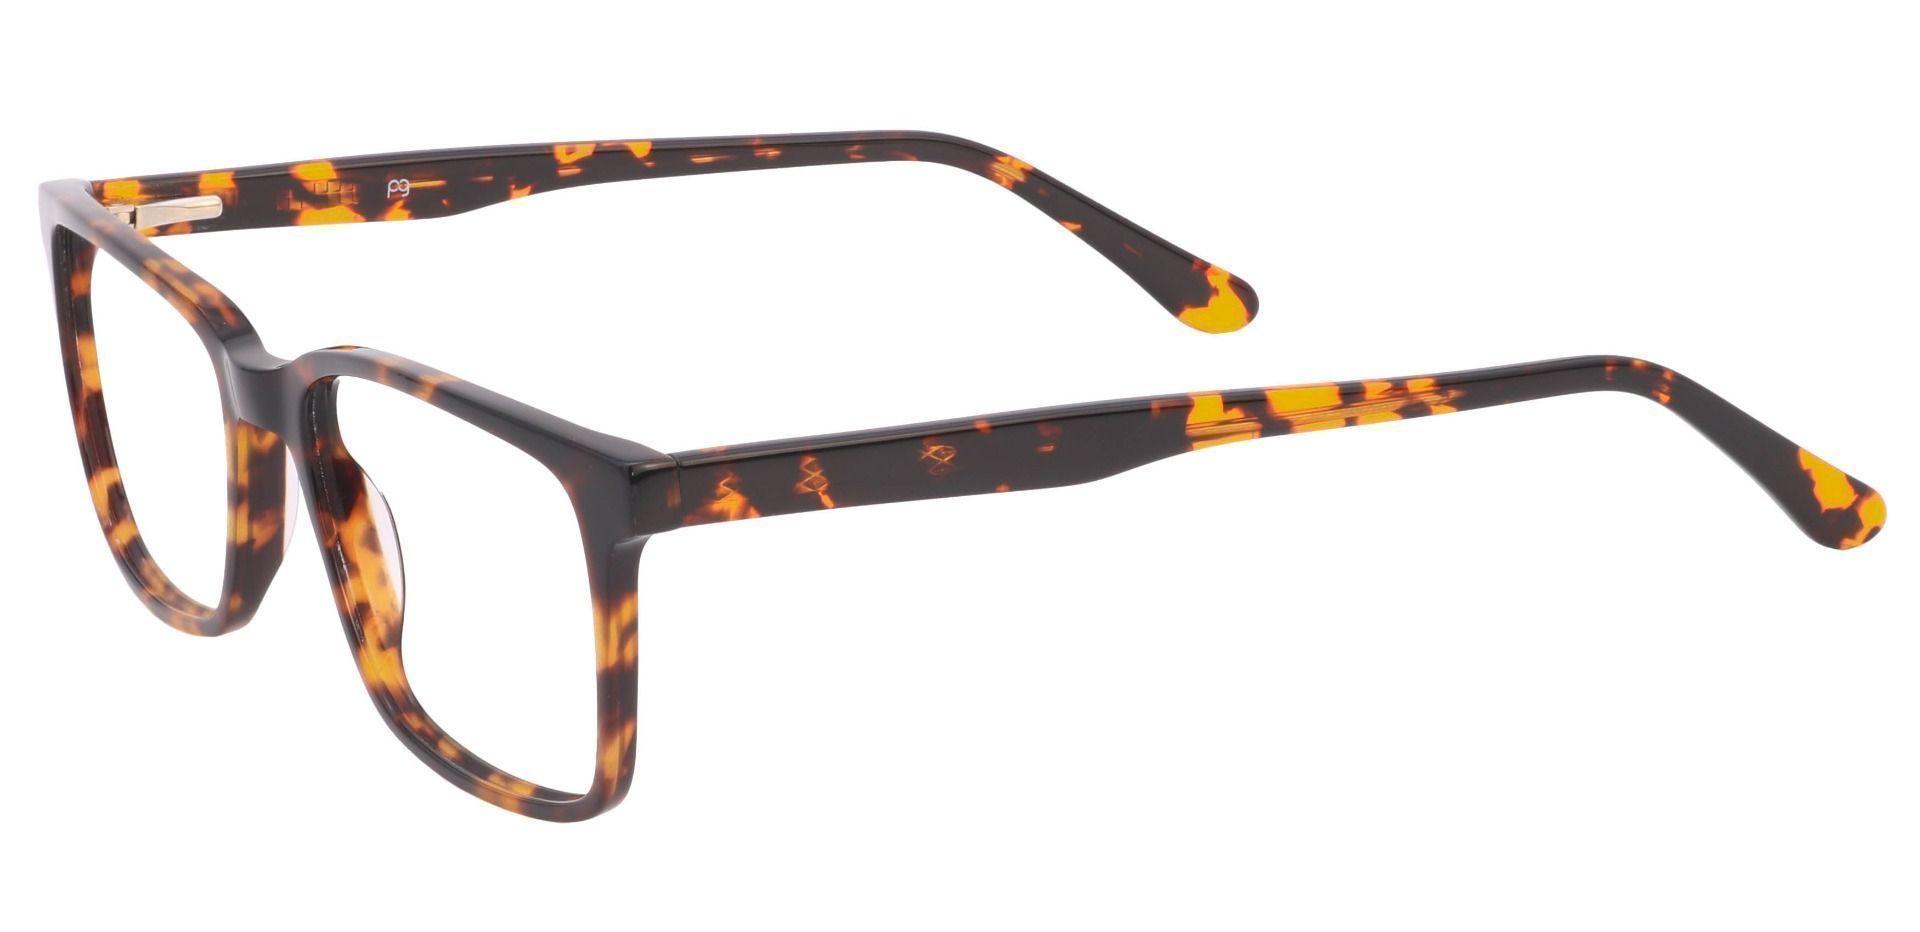 Venice Rectangle Blue Light Blocking Glasses - Tortoise